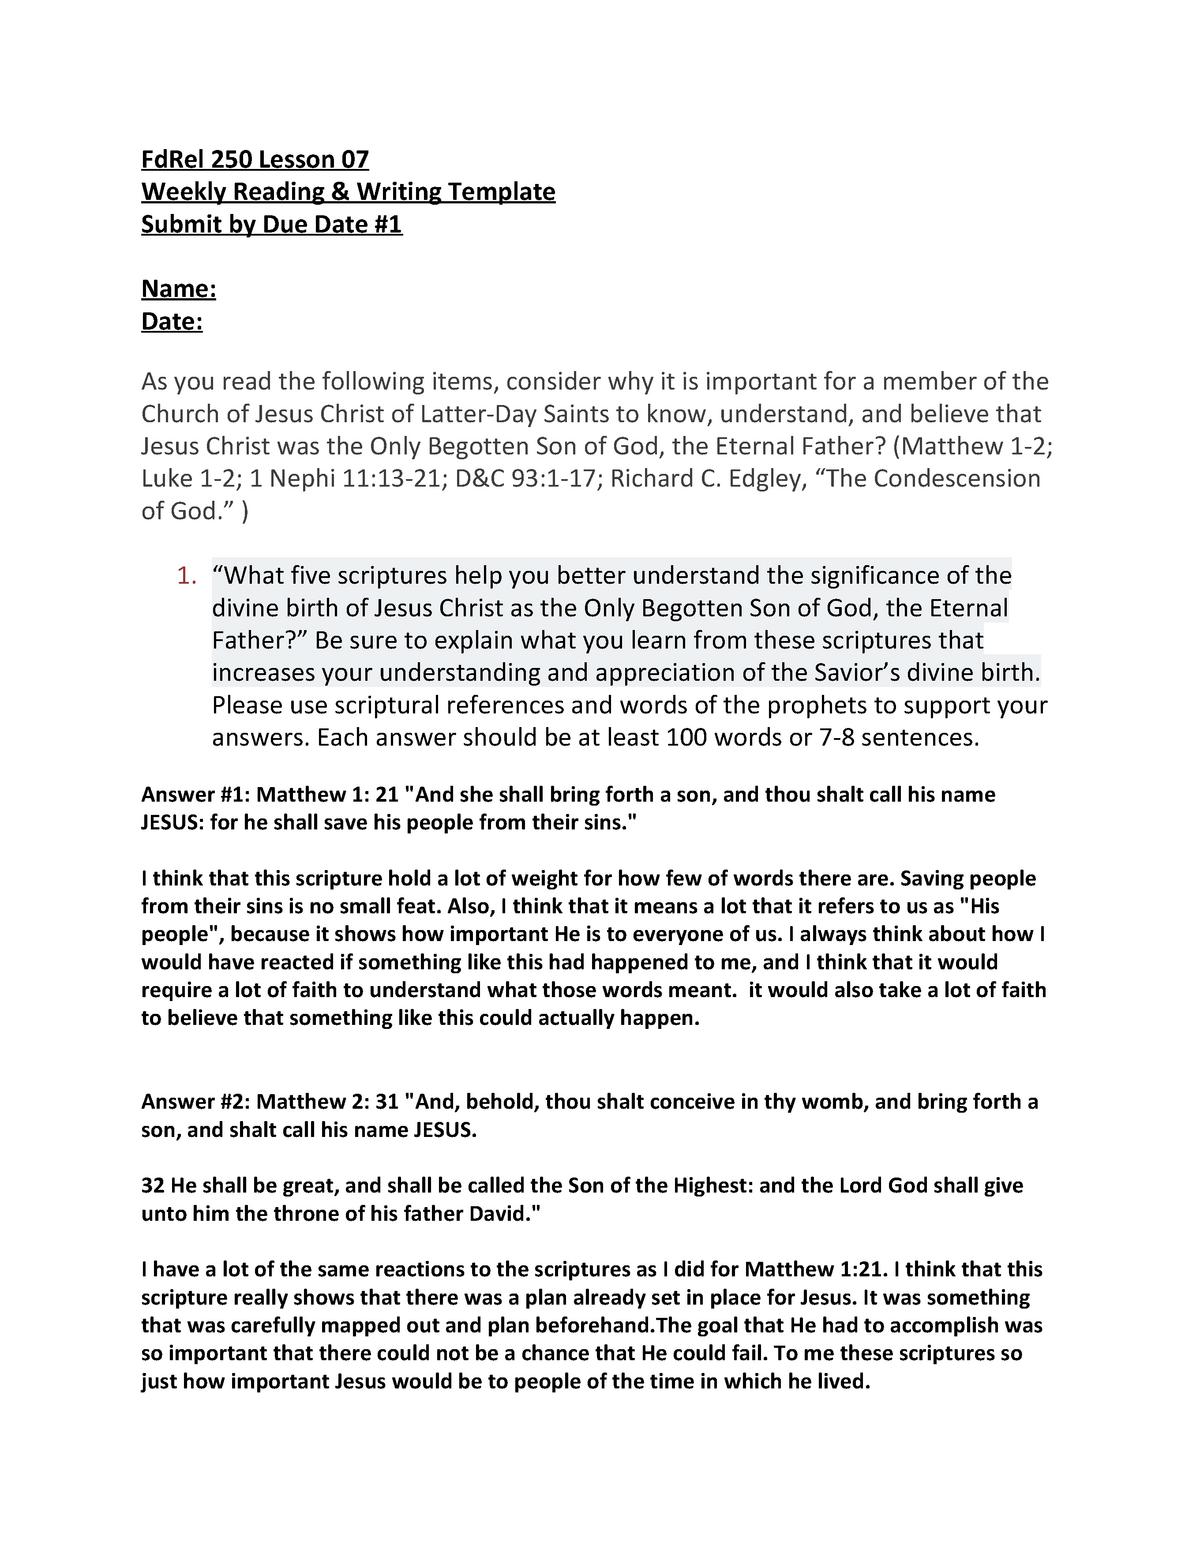 fca9b4fc Fd Rel 250 Lesson 07 Writing Template - FDREL250: Jesus Christ And The  Everlasting Gospel - StuDocu